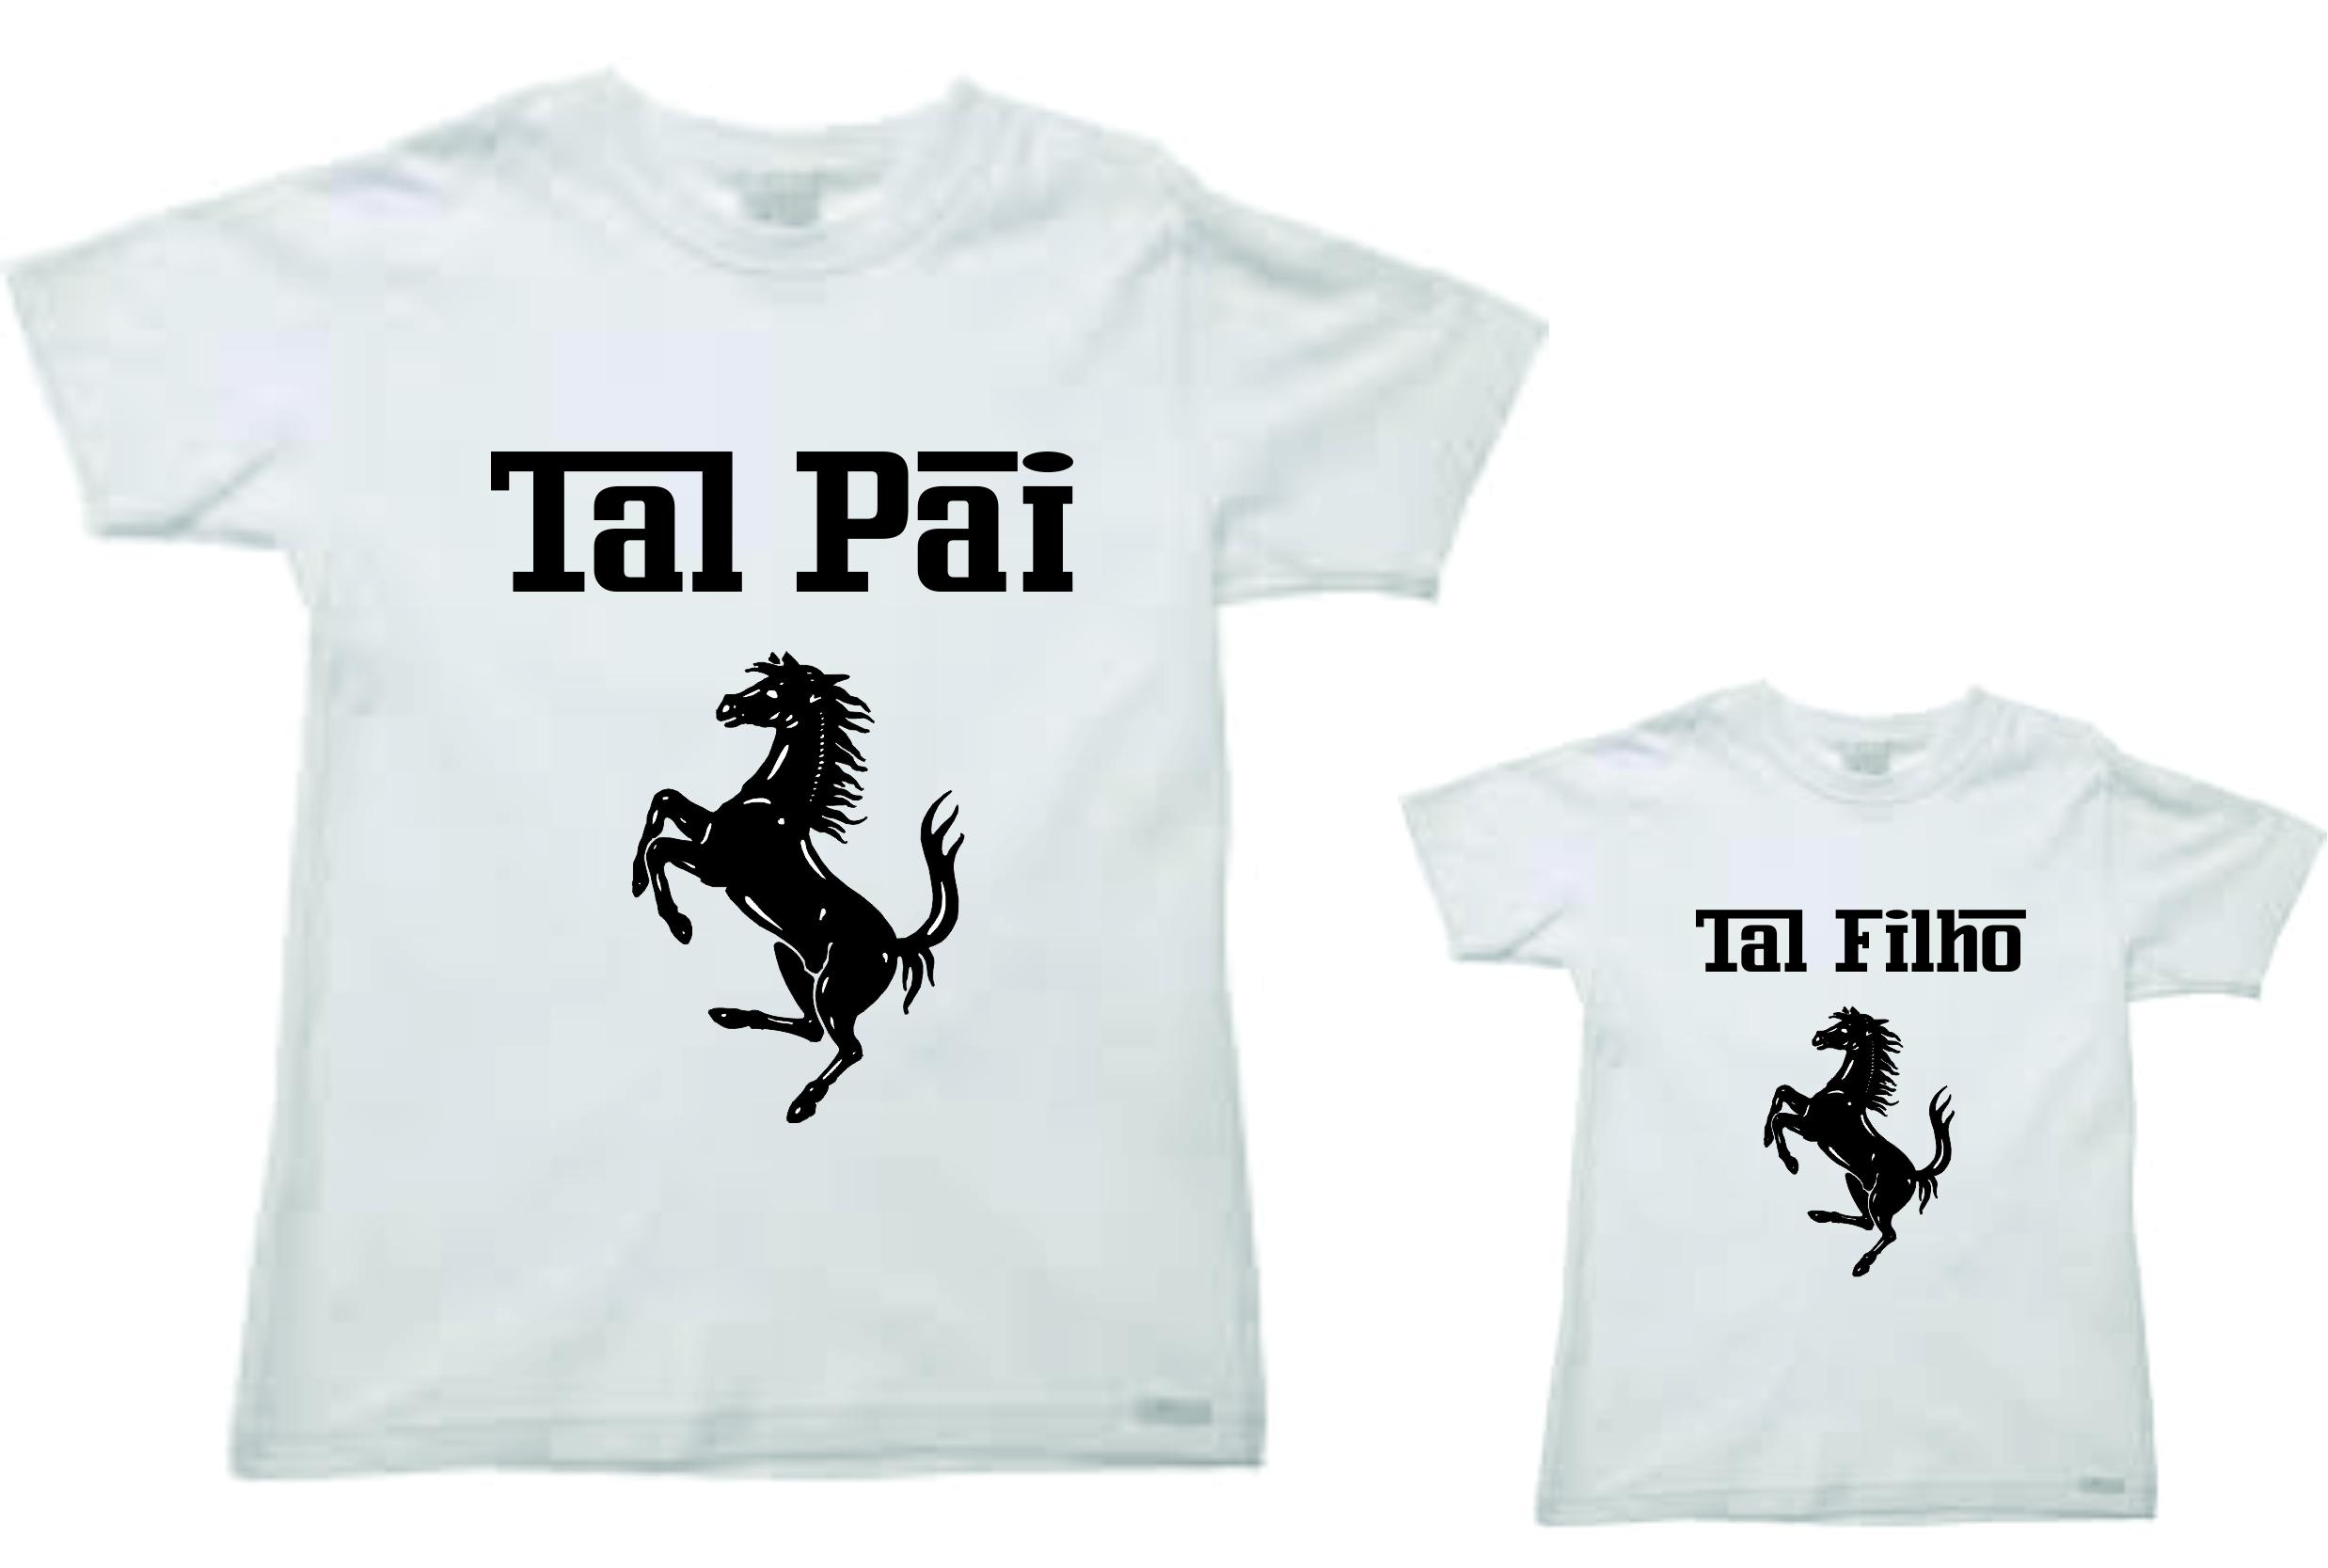 Camiseta Personalizada Pai e Filho  ba5d1a425d096